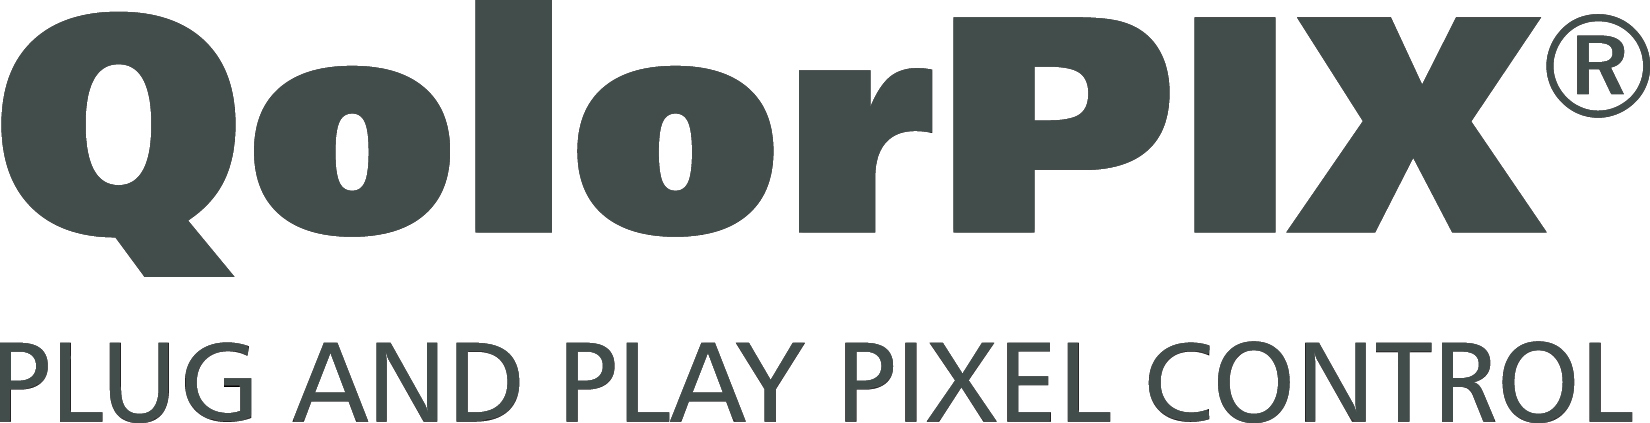 QolorPIX-PlugandPlay-PixelControl-logo-grey